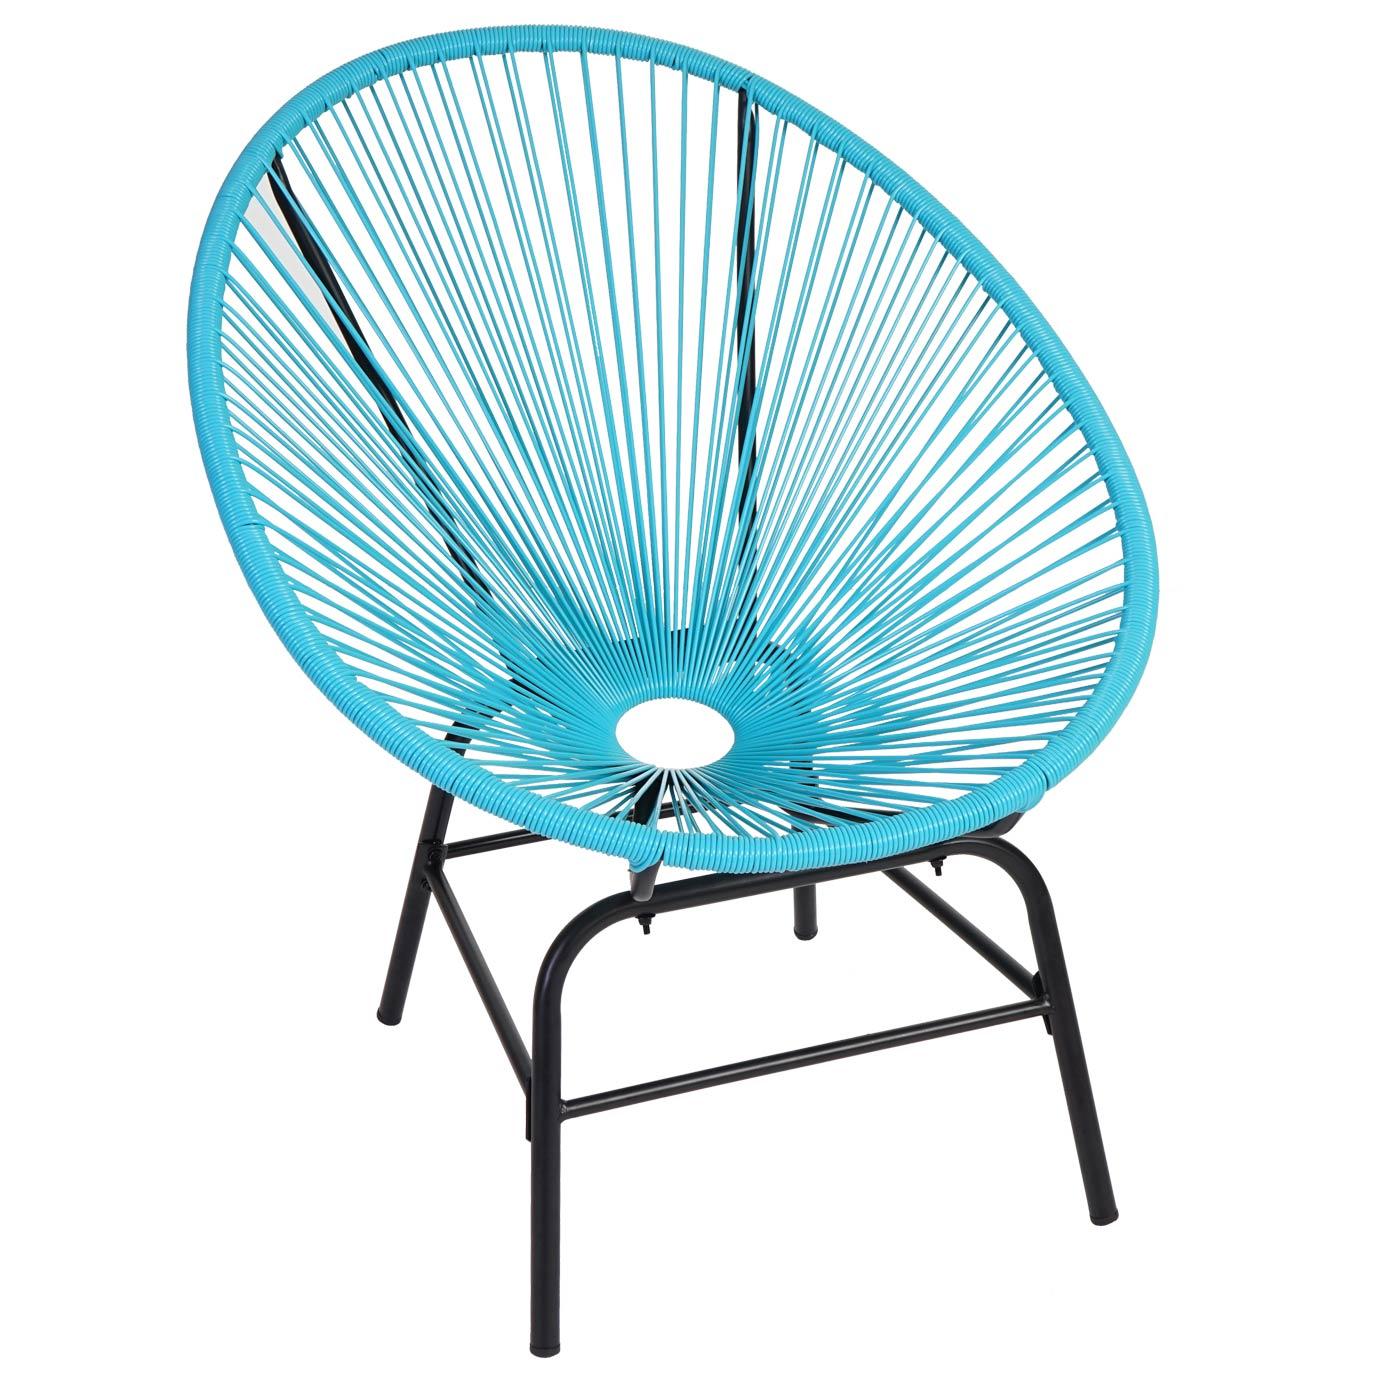 2x poly rattan gartensessel suzano spaghetti gartenstuhl. Black Bedroom Furniture Sets. Home Design Ideas